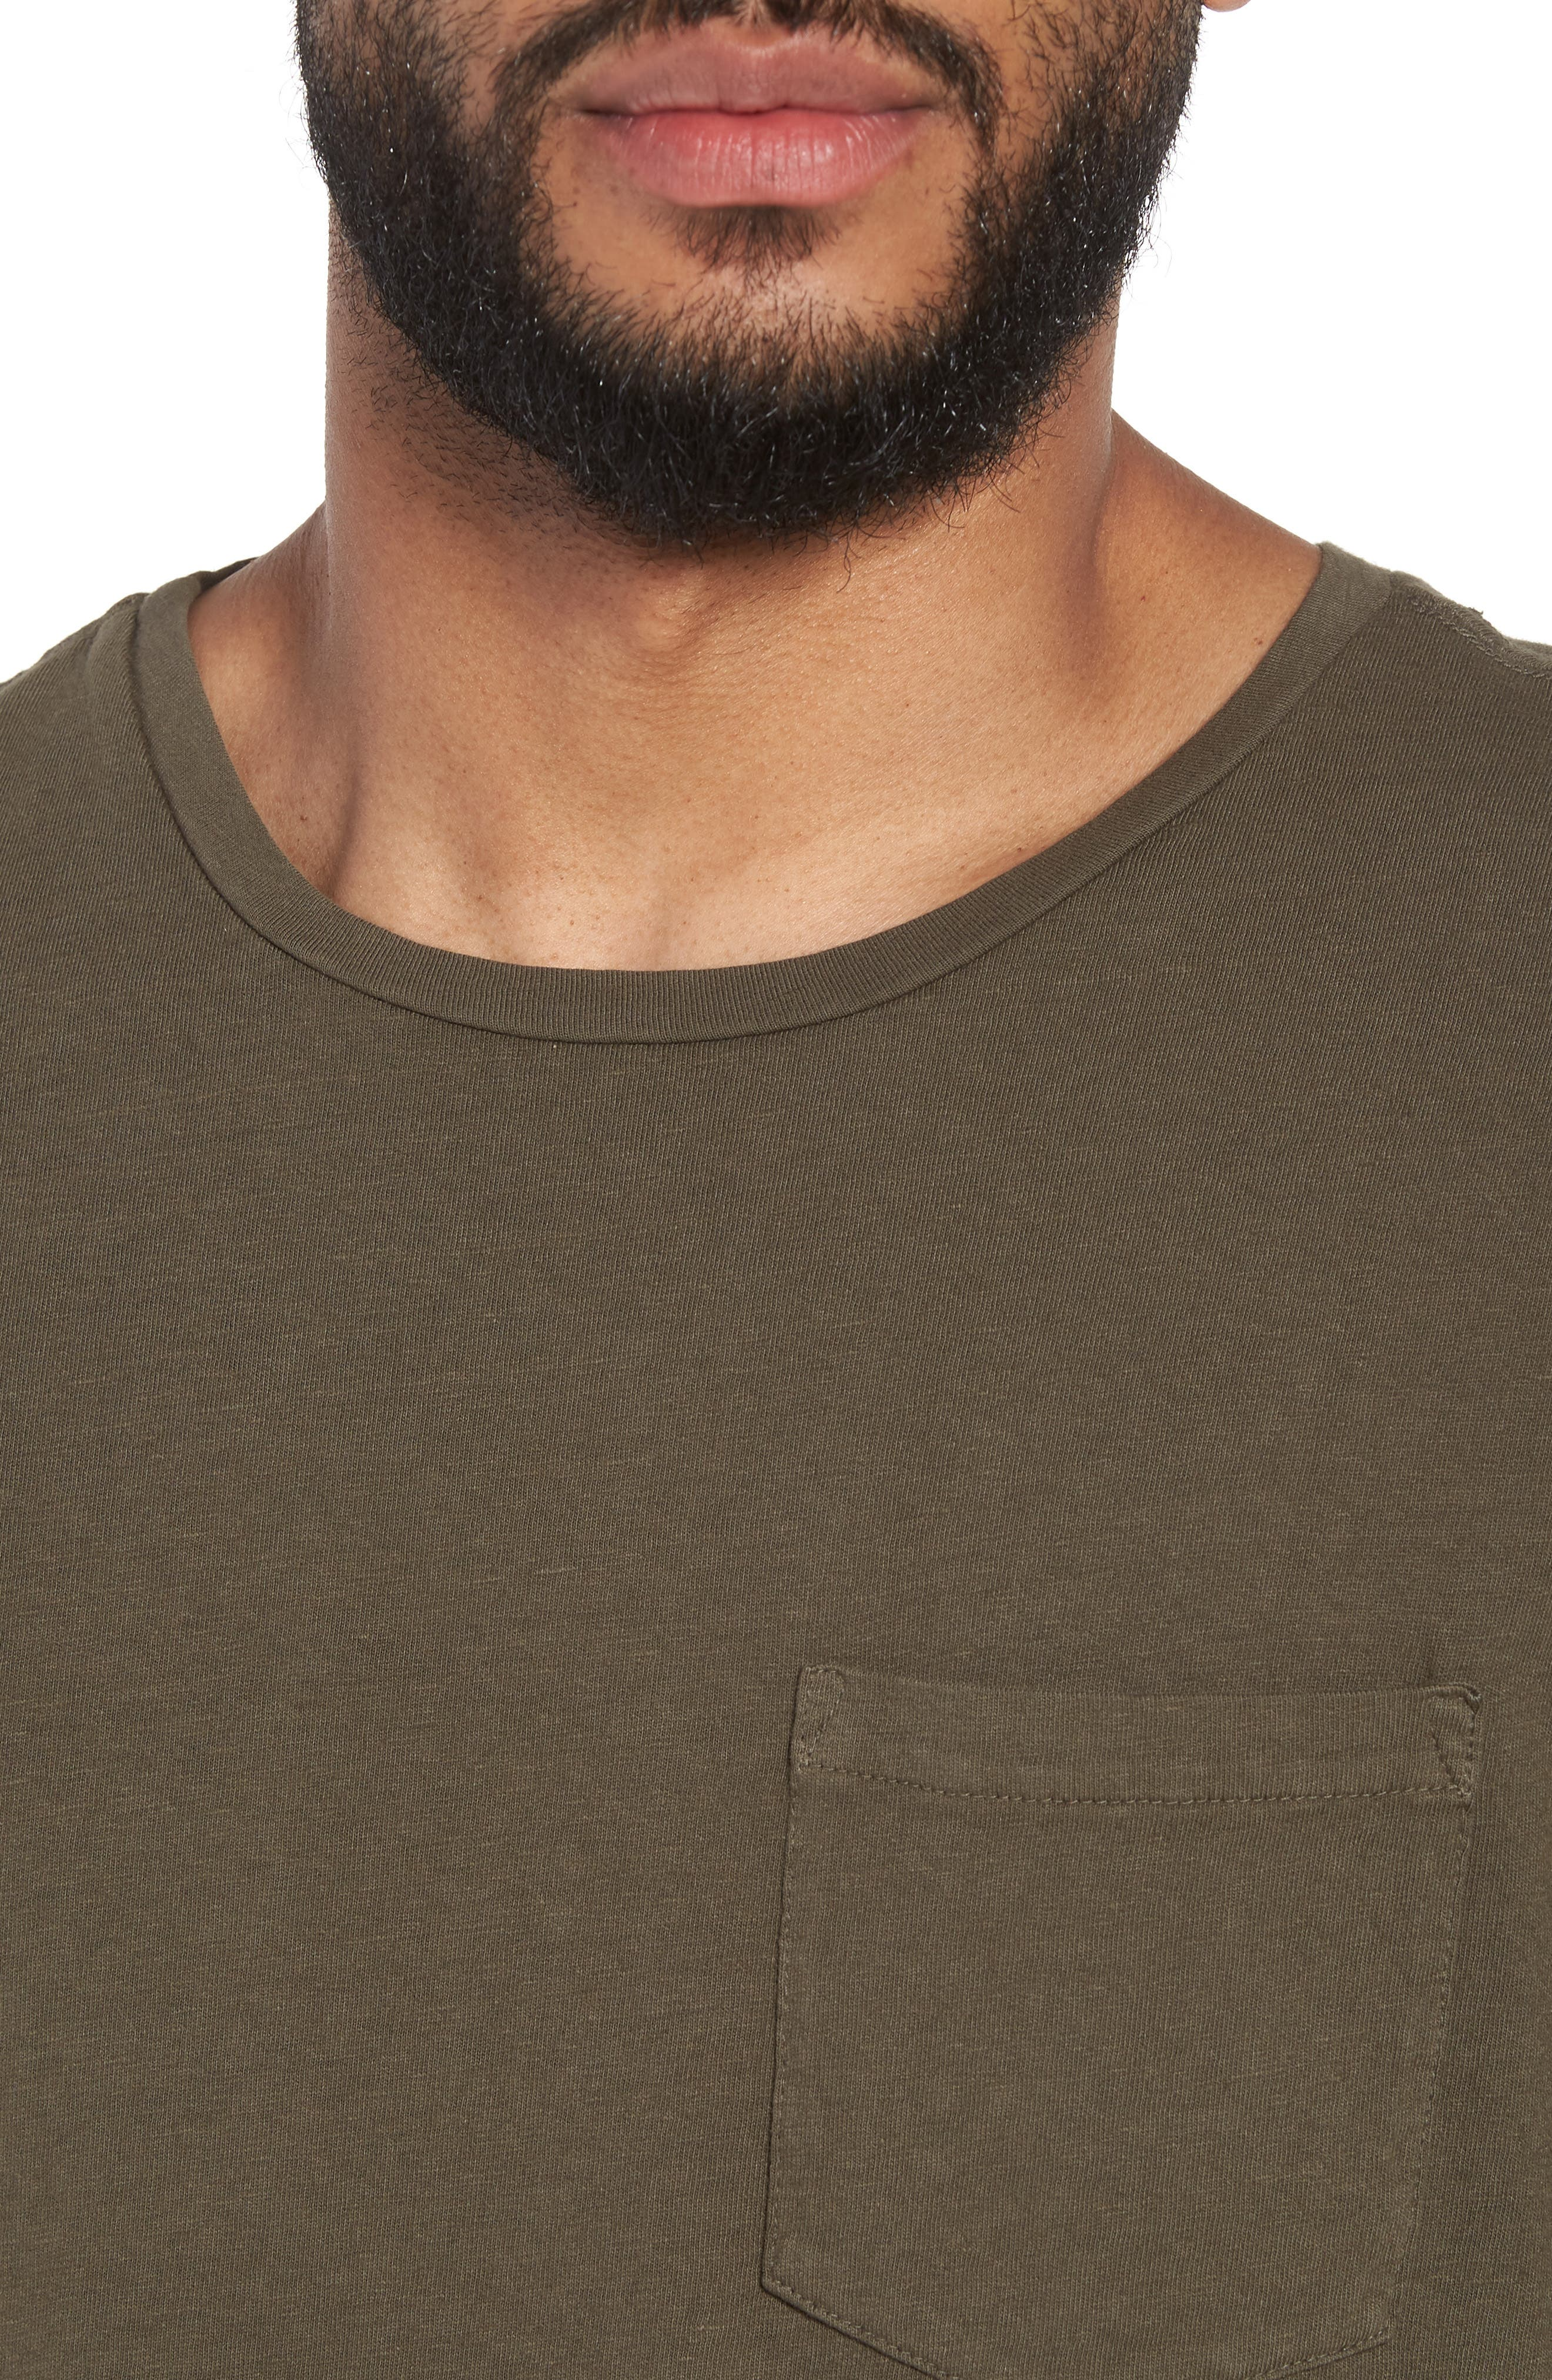 Pocket T-Shirt,                             Alternate thumbnail 4, color,                             Olive